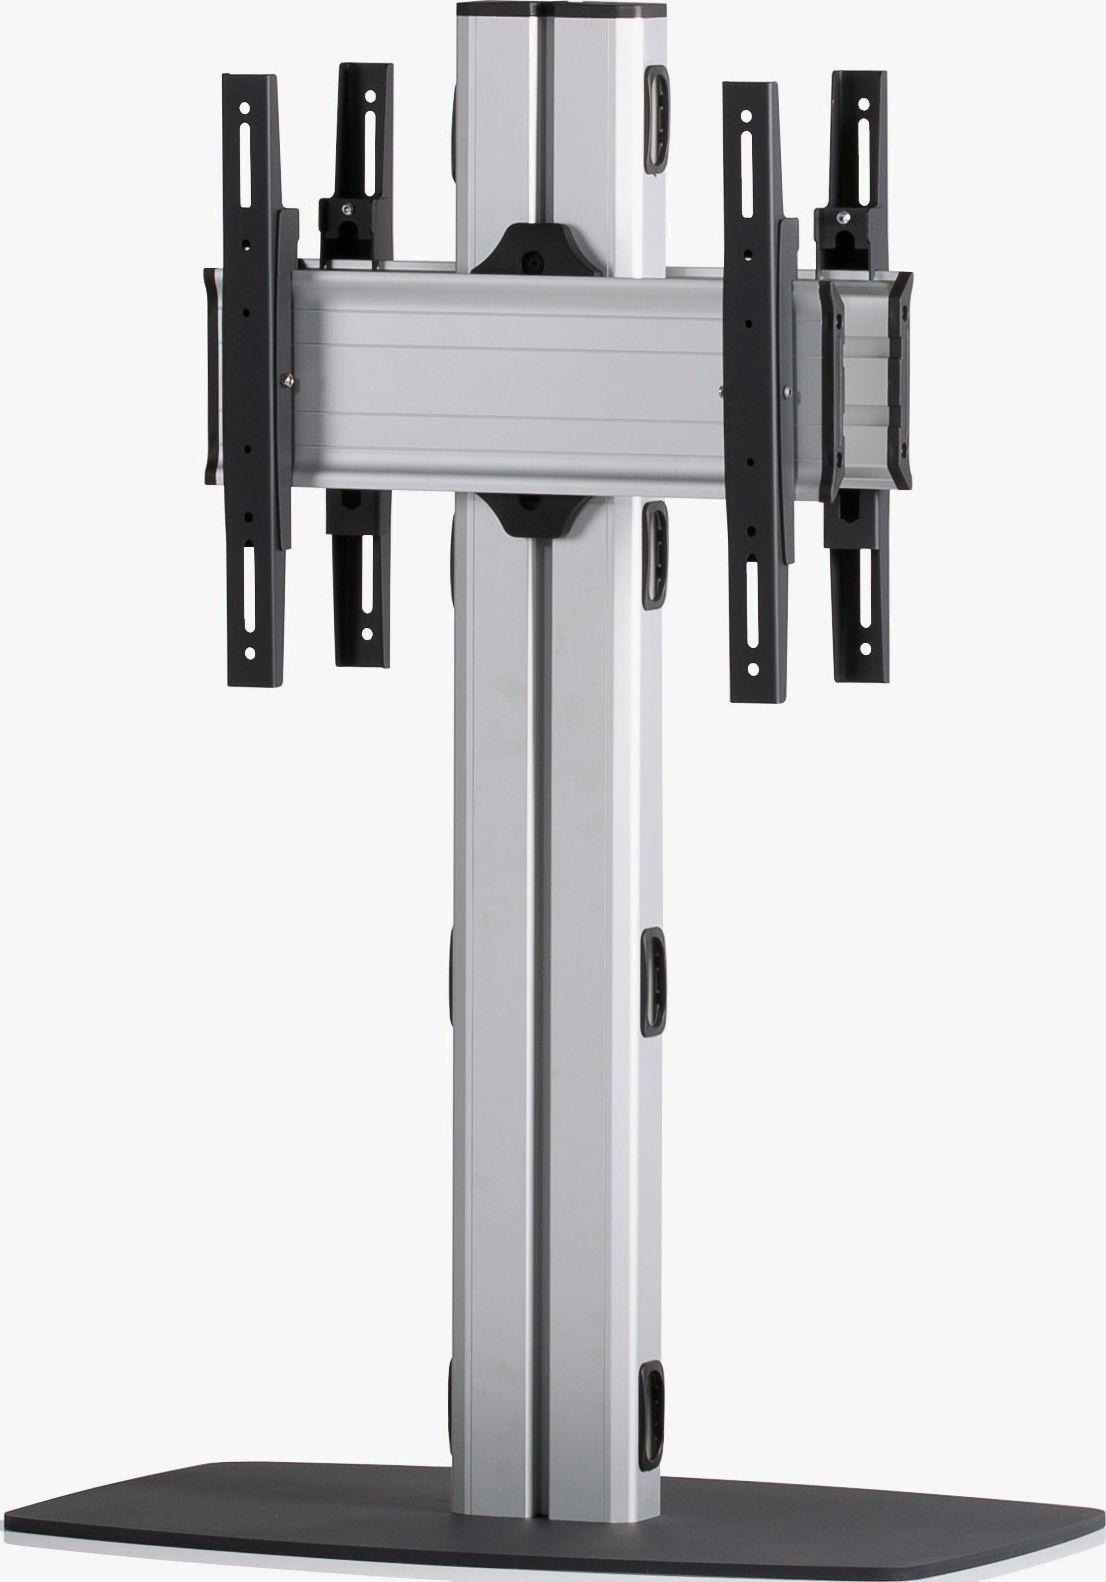 2 Displays 1×1 beidseitig, Höhe 110 cm, Standard-VESA, mit Standfuß